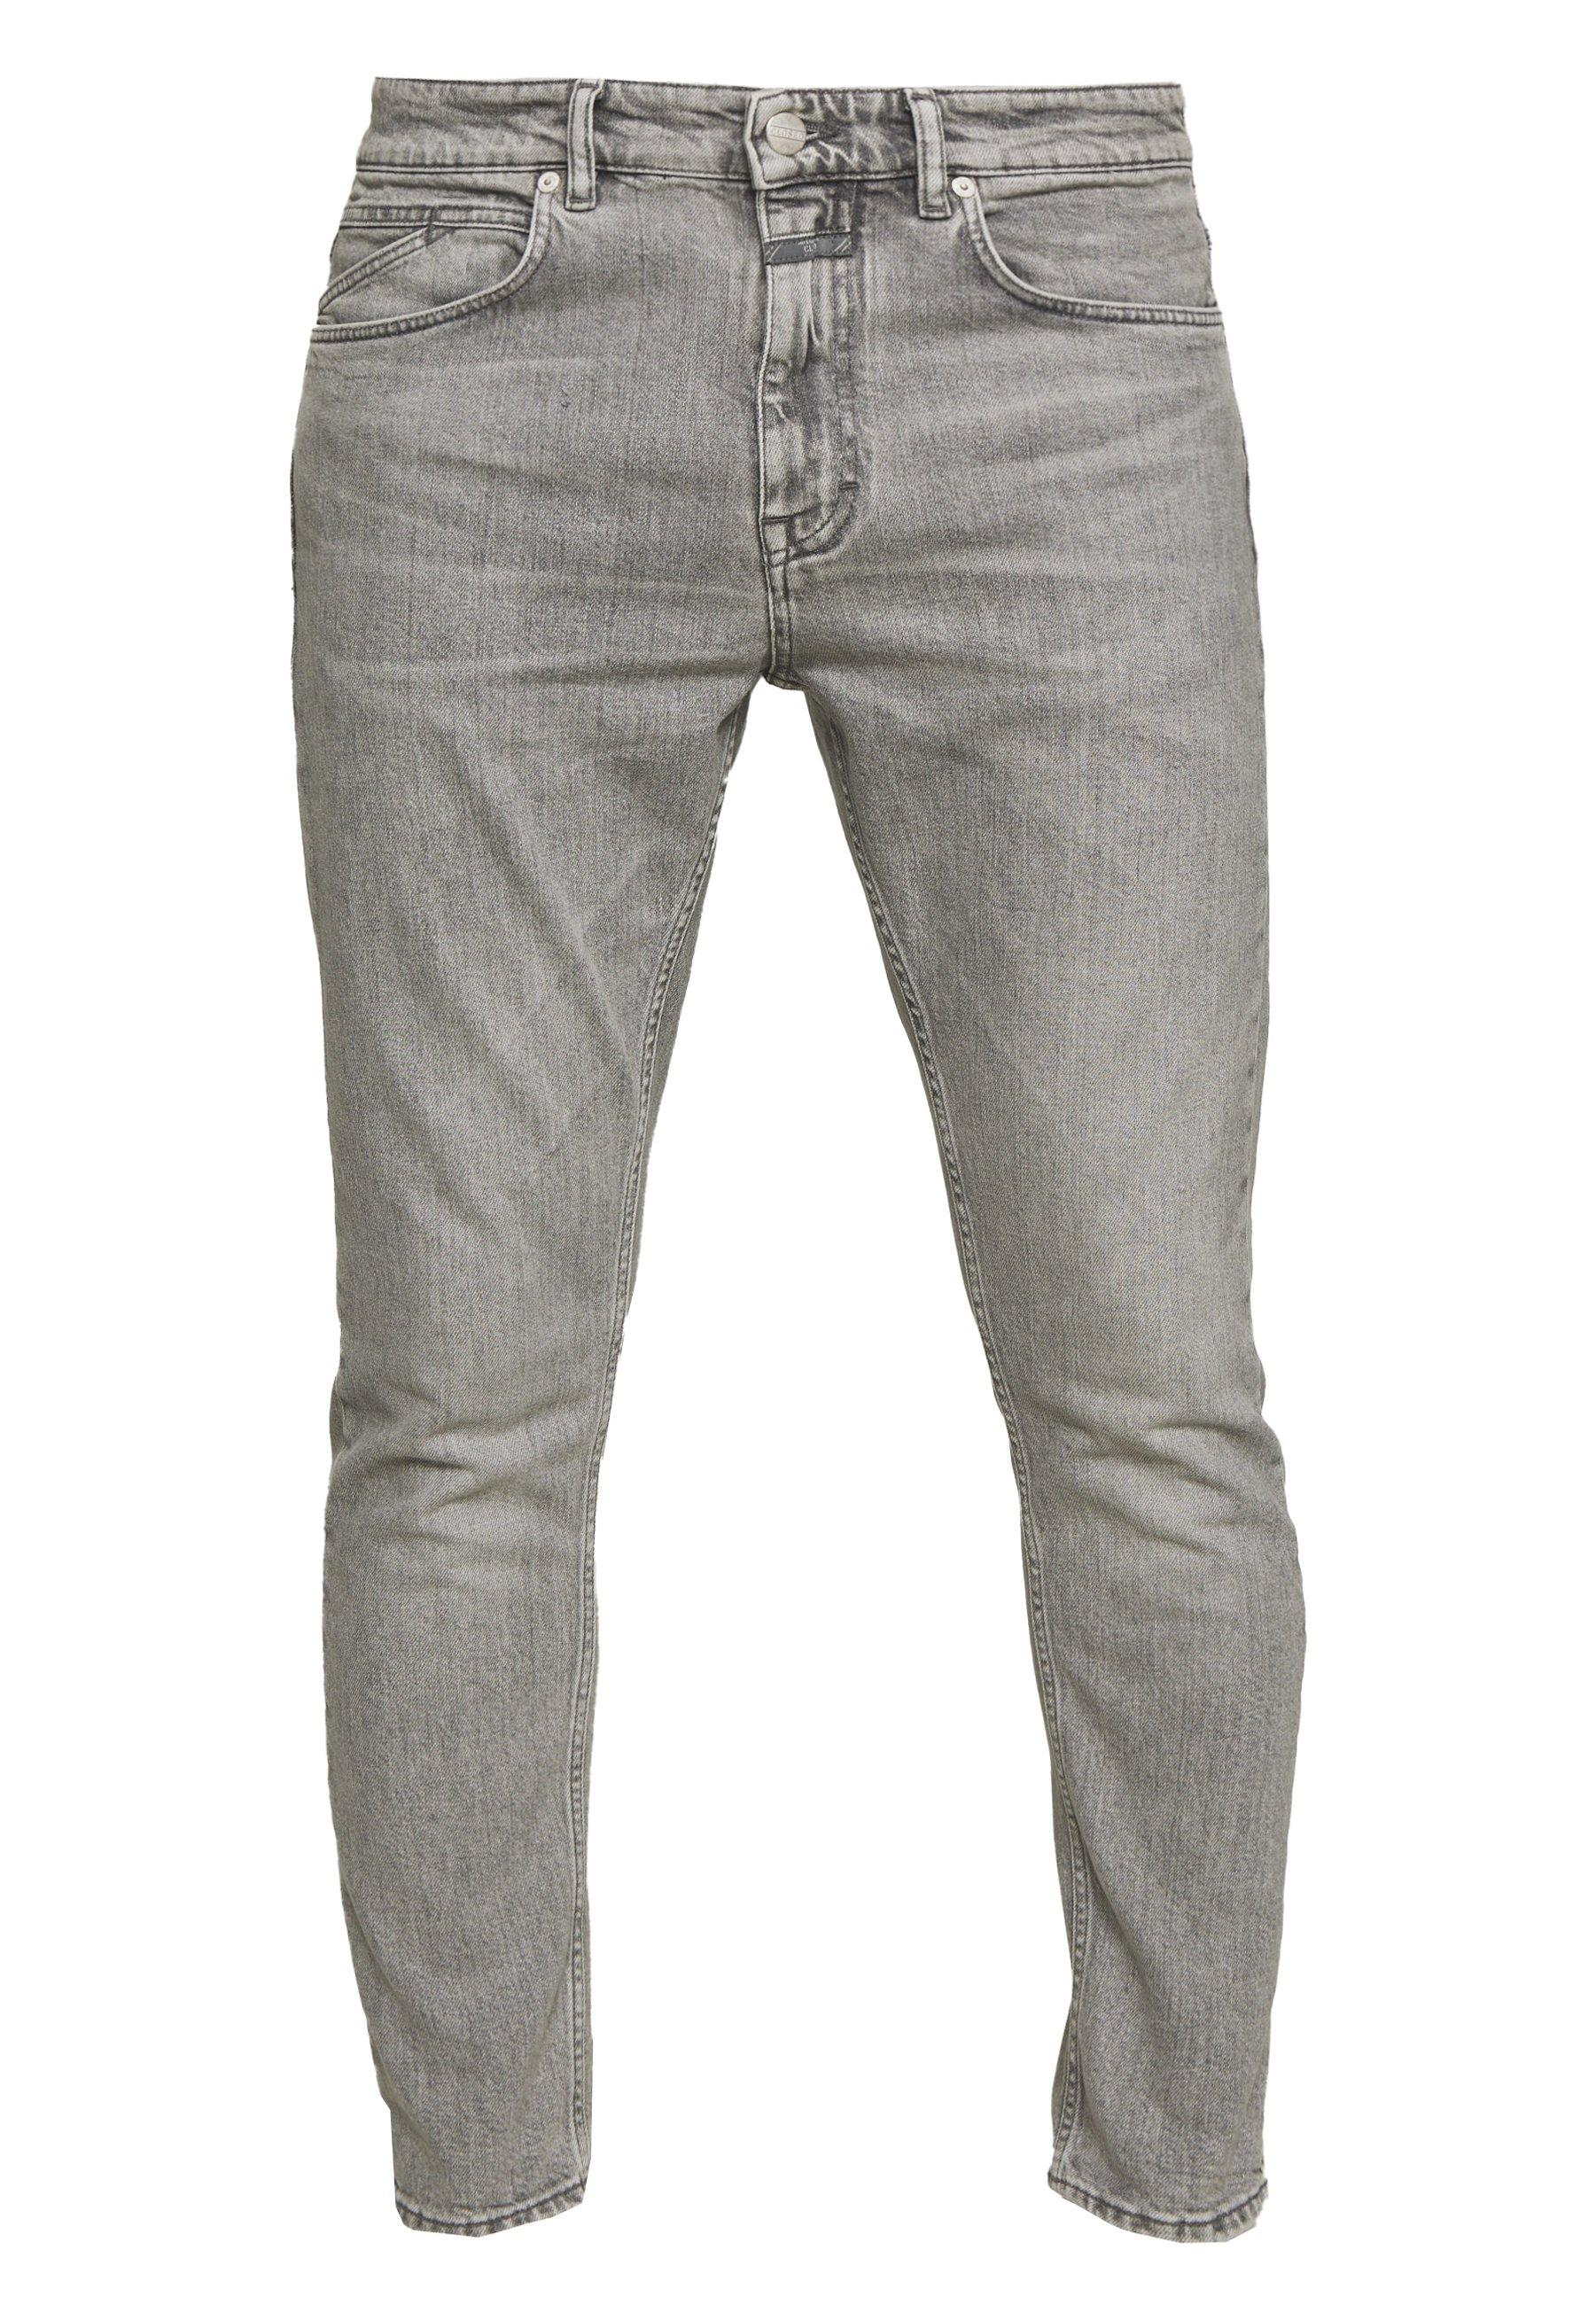 CLOSED COOPER - Jeans fuselé - mid grey